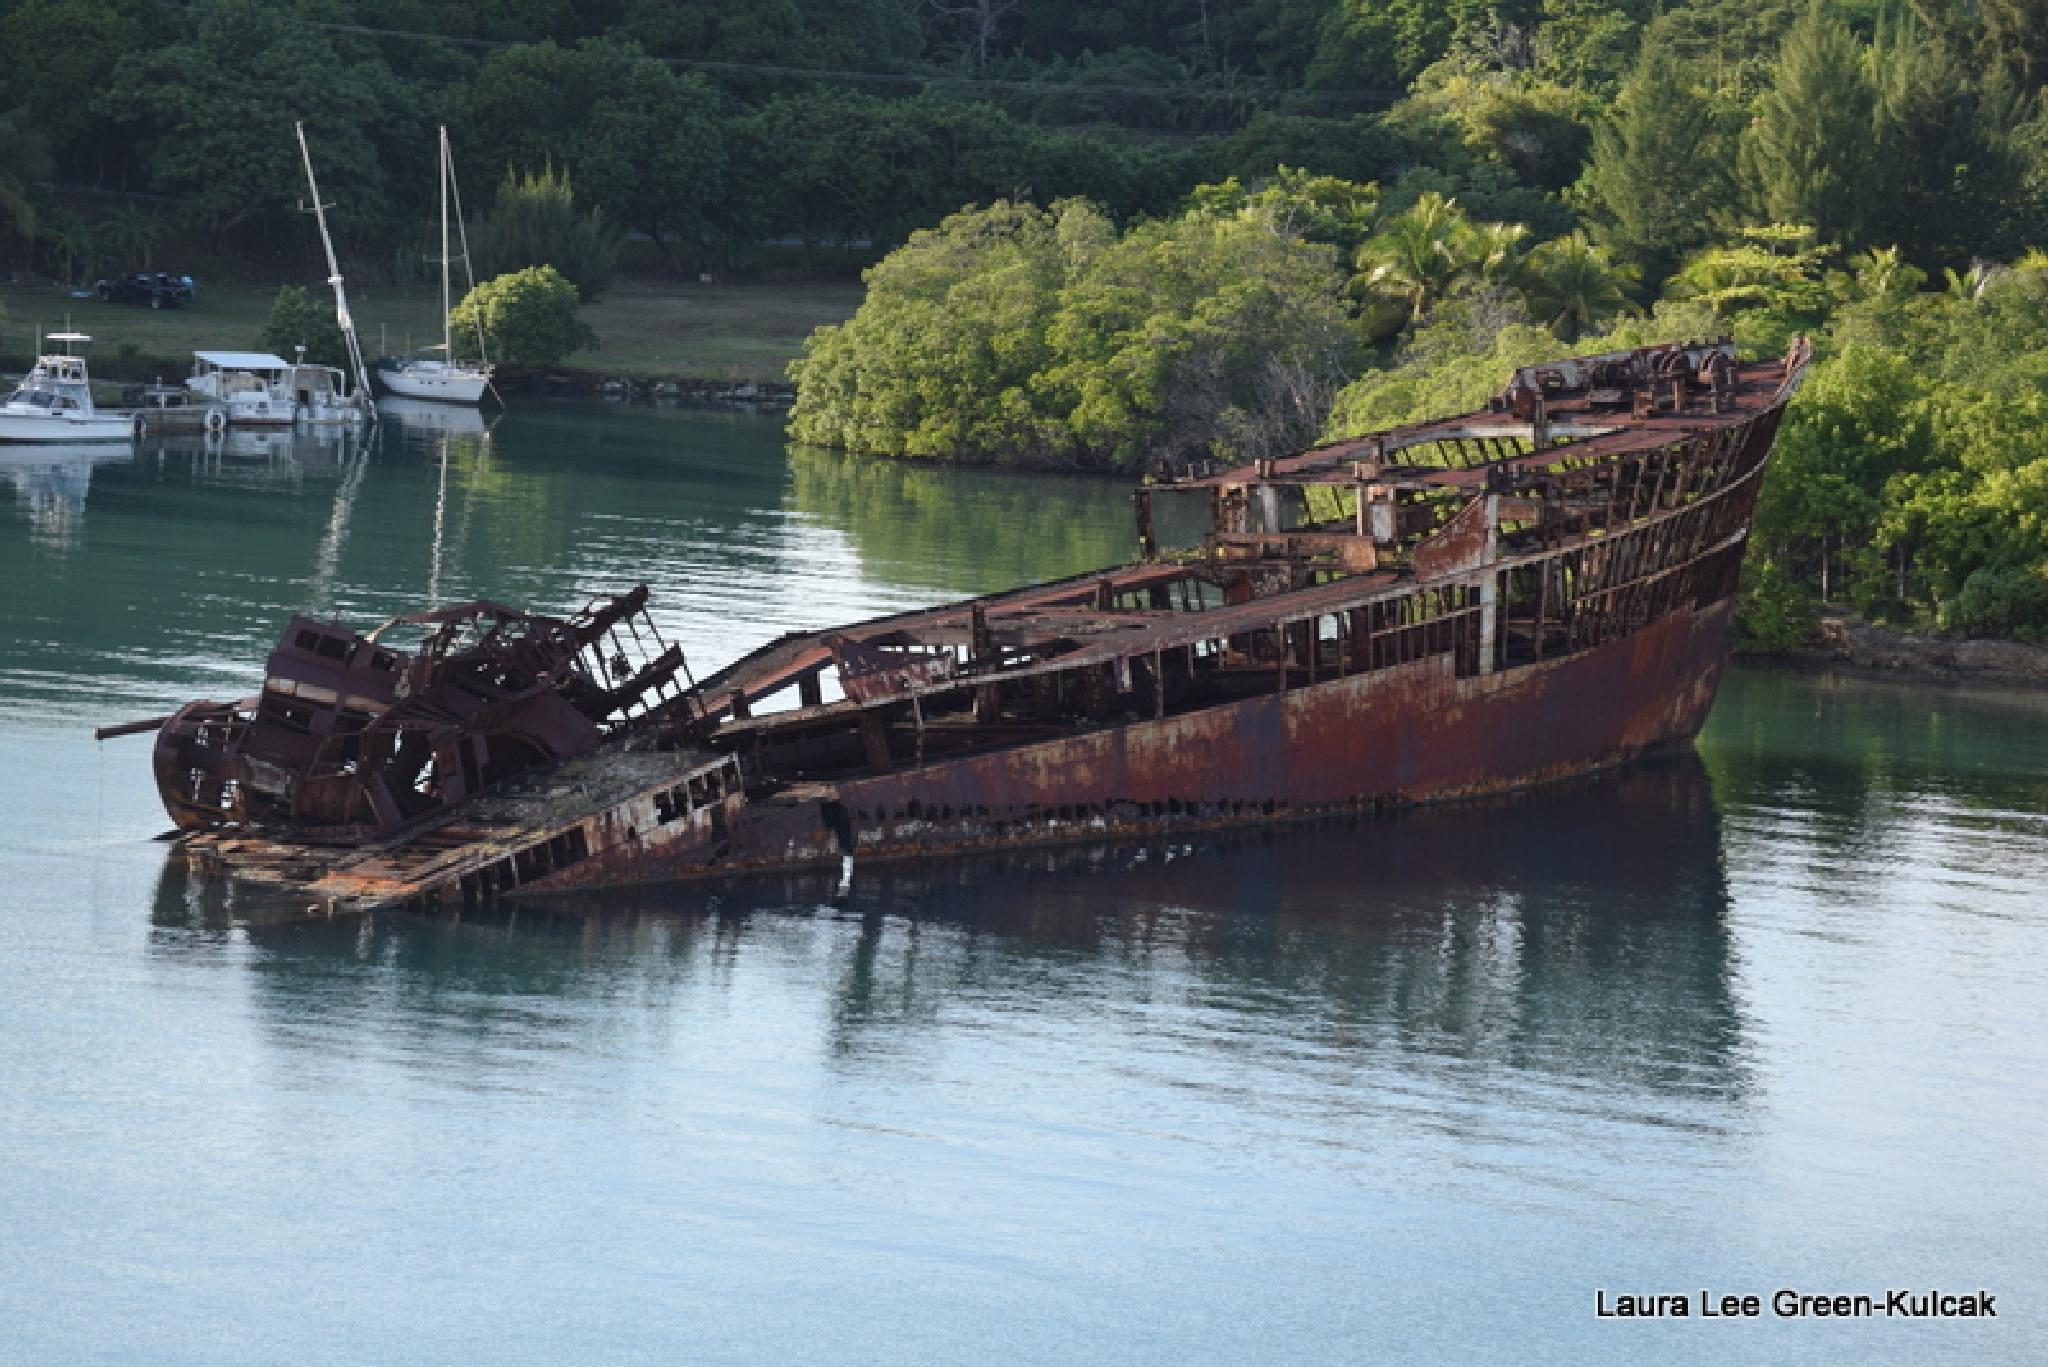 Shipwreak up close by Laura Lee Green-Kulcak